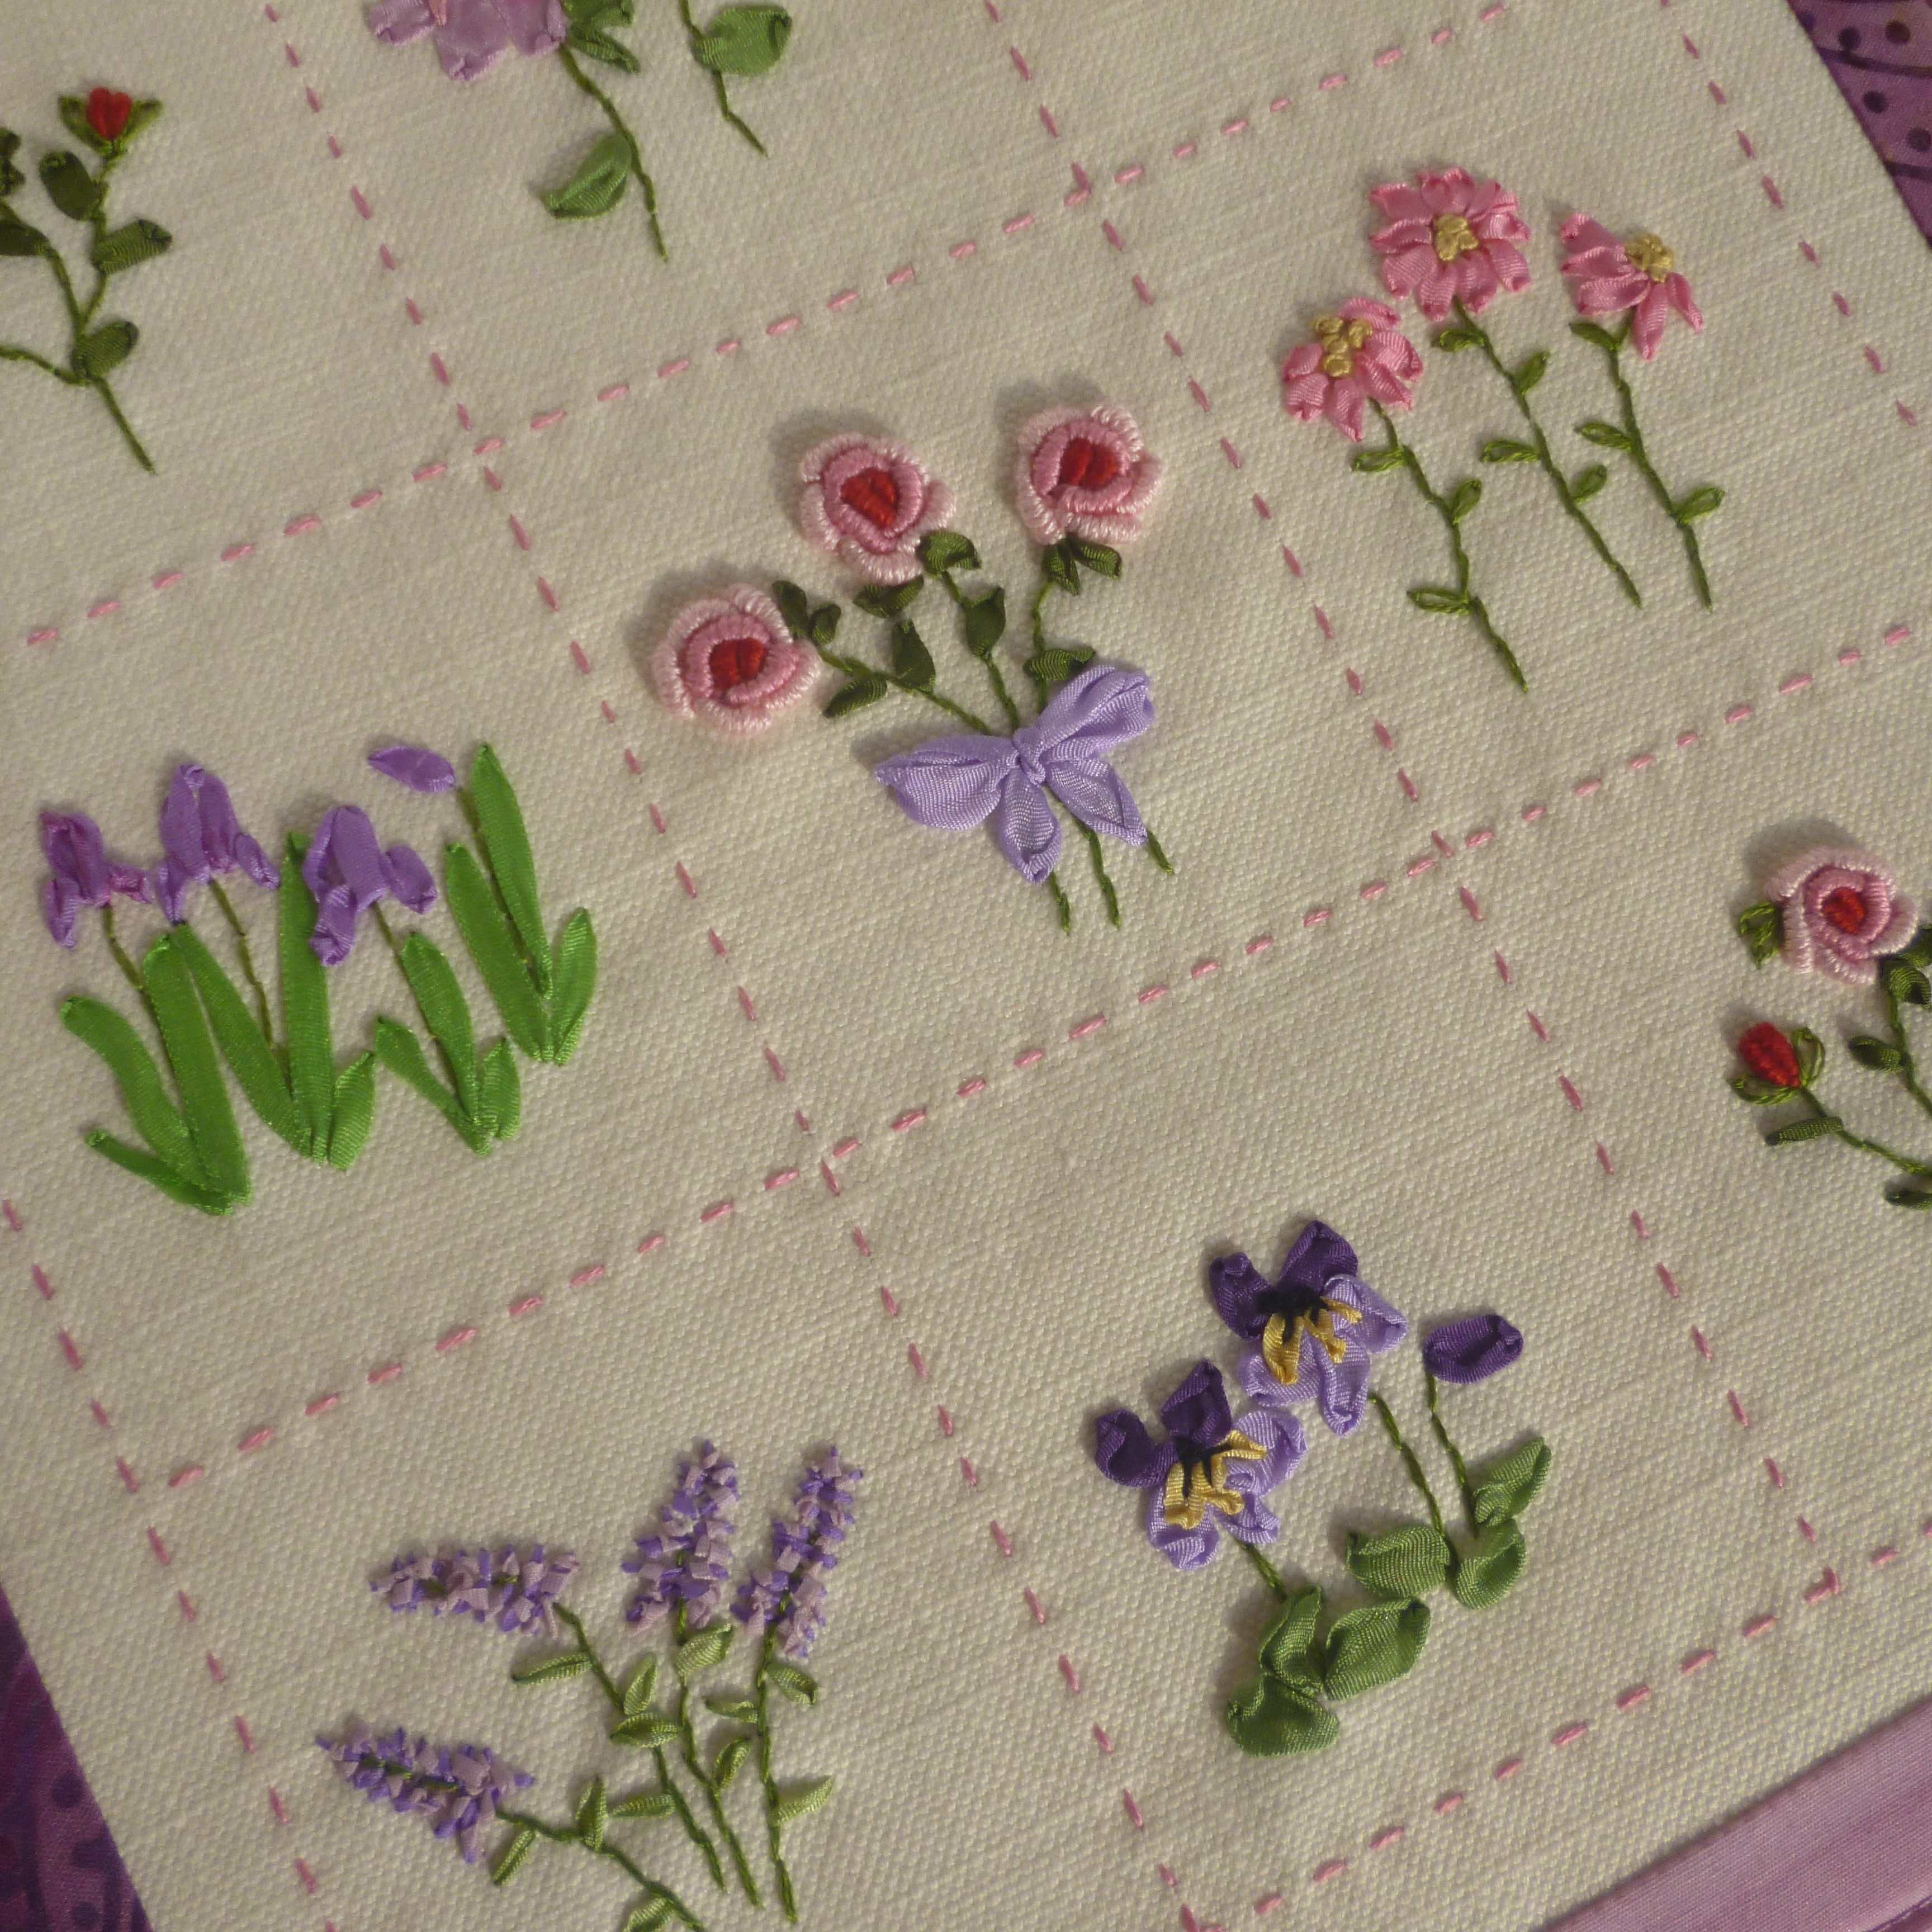 florecitas bordadas | Bordados | Pinterest | Bordado, Flor y Puntadas